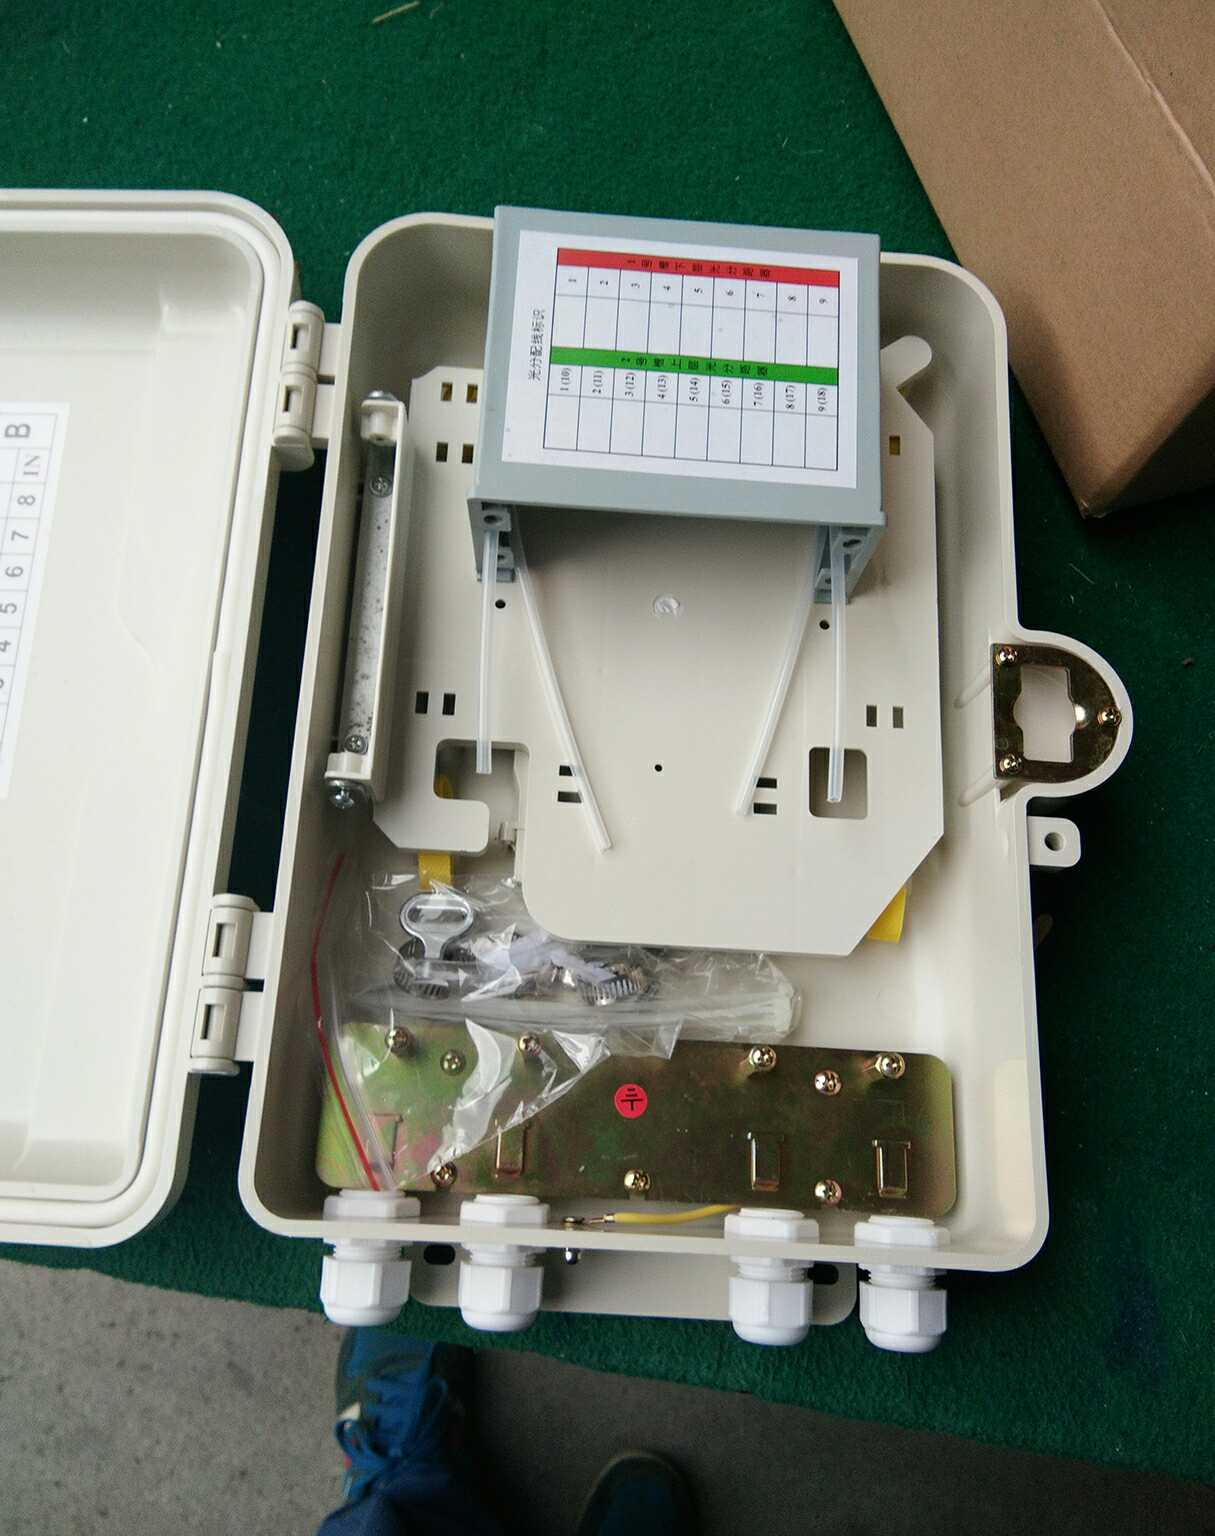 PC合金16芯插片式分光箱分纤箱1比16芯光纤光分箱室内室外用